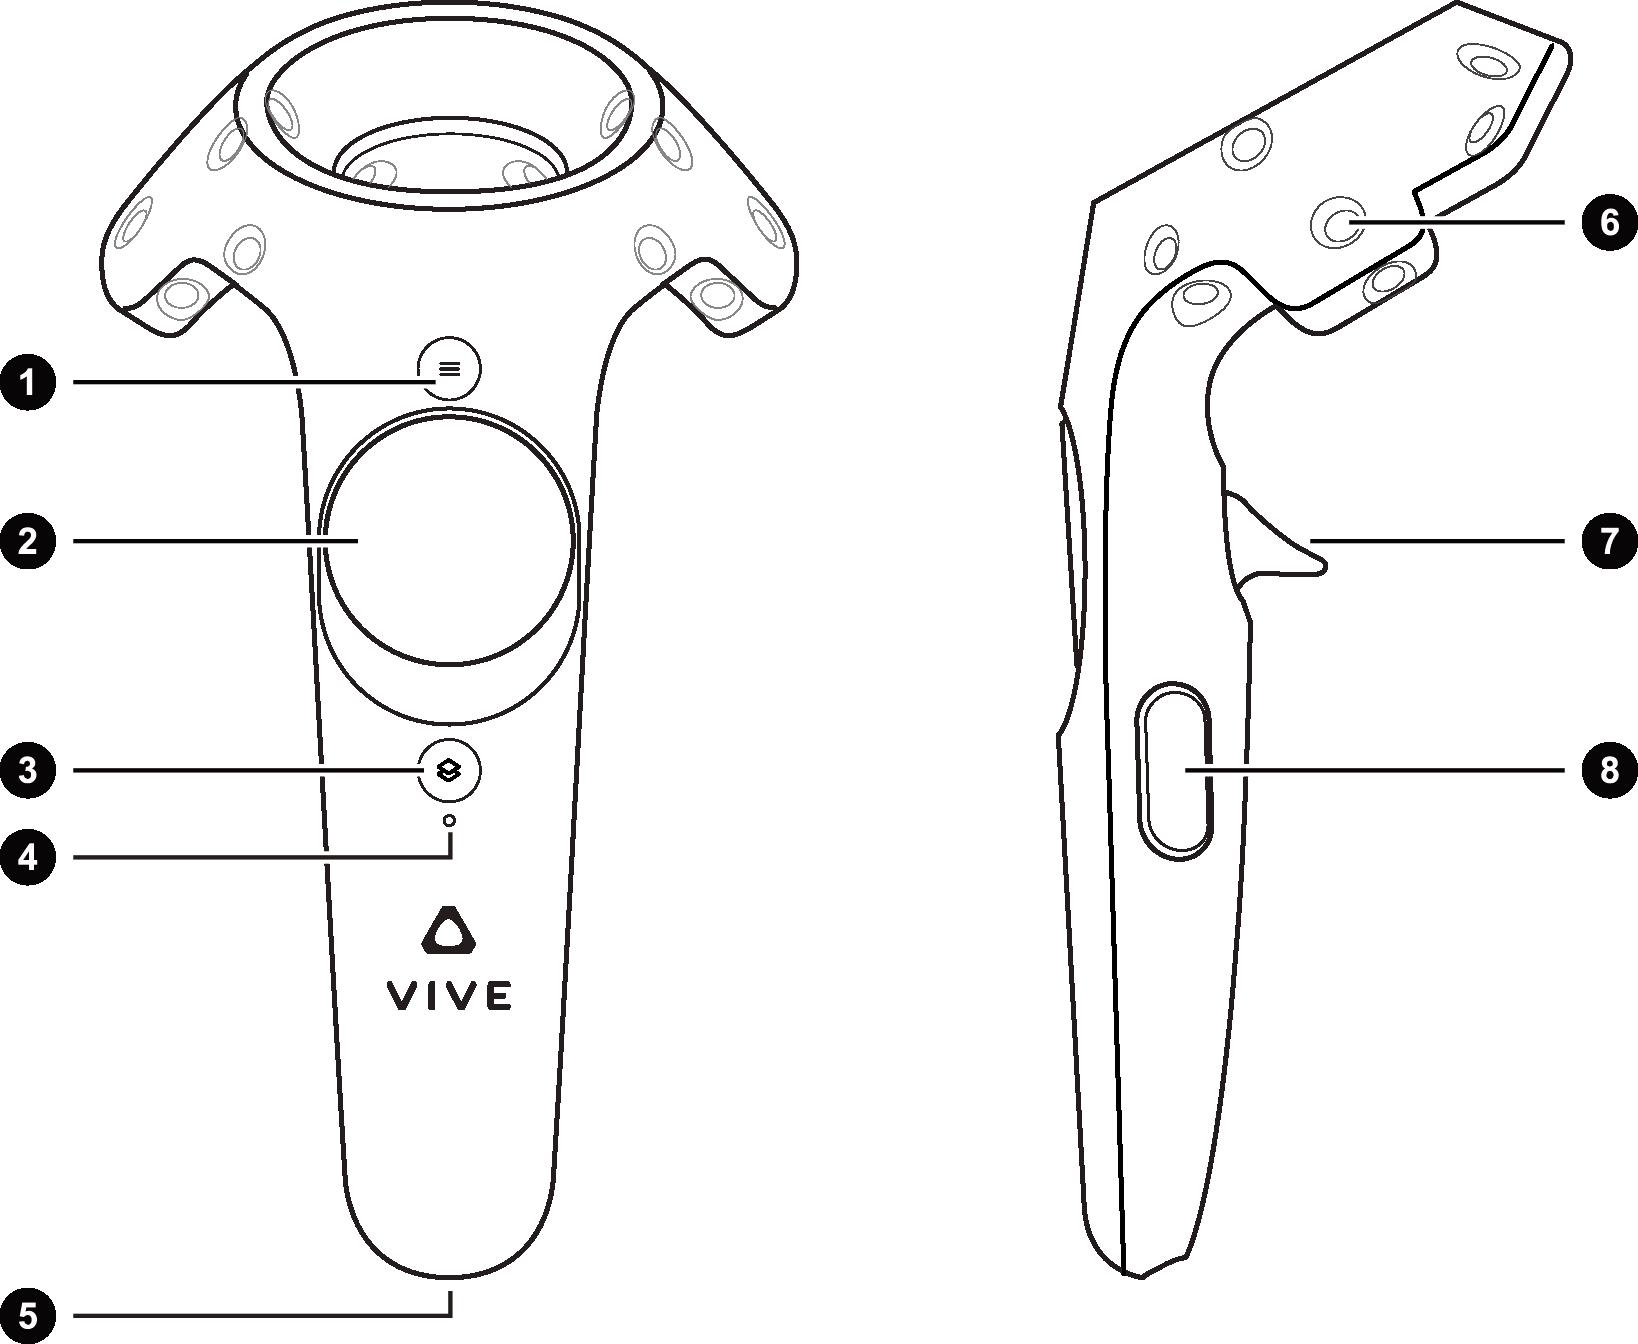 Grease Trap Diagram on Mustang Wiring Diagram